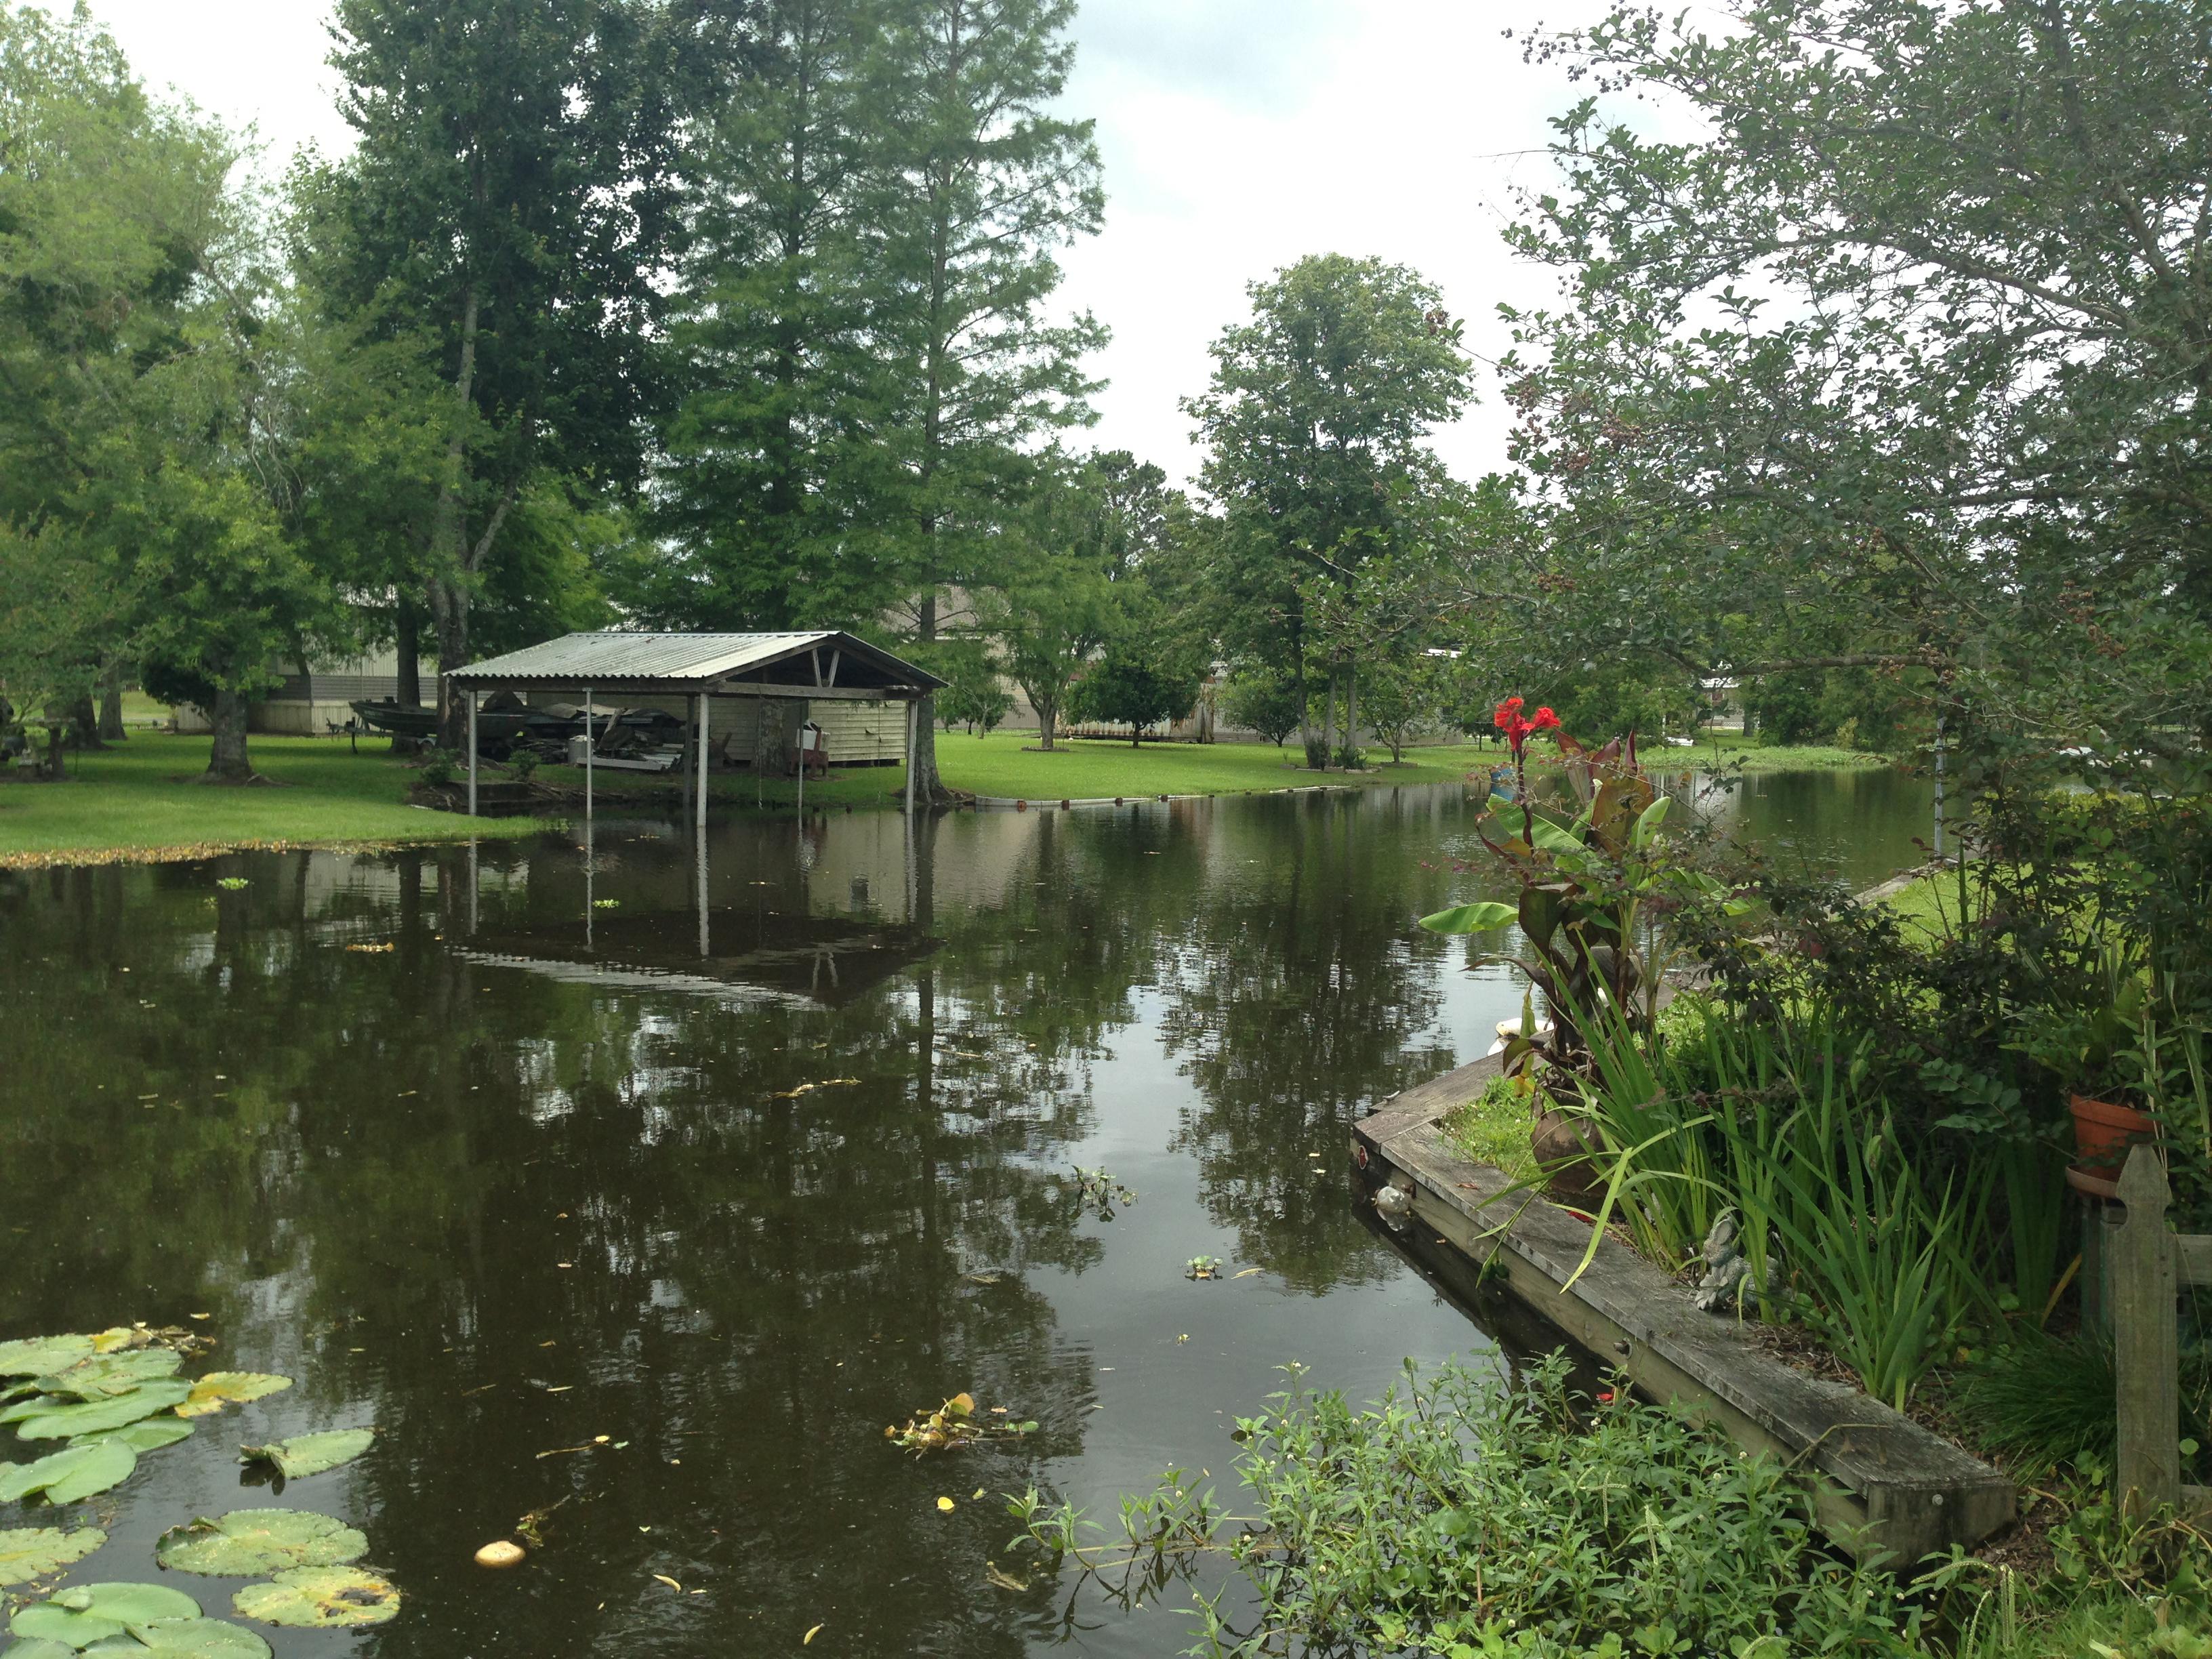 Living On Earth Bayou Community Struggles With Sinkhole